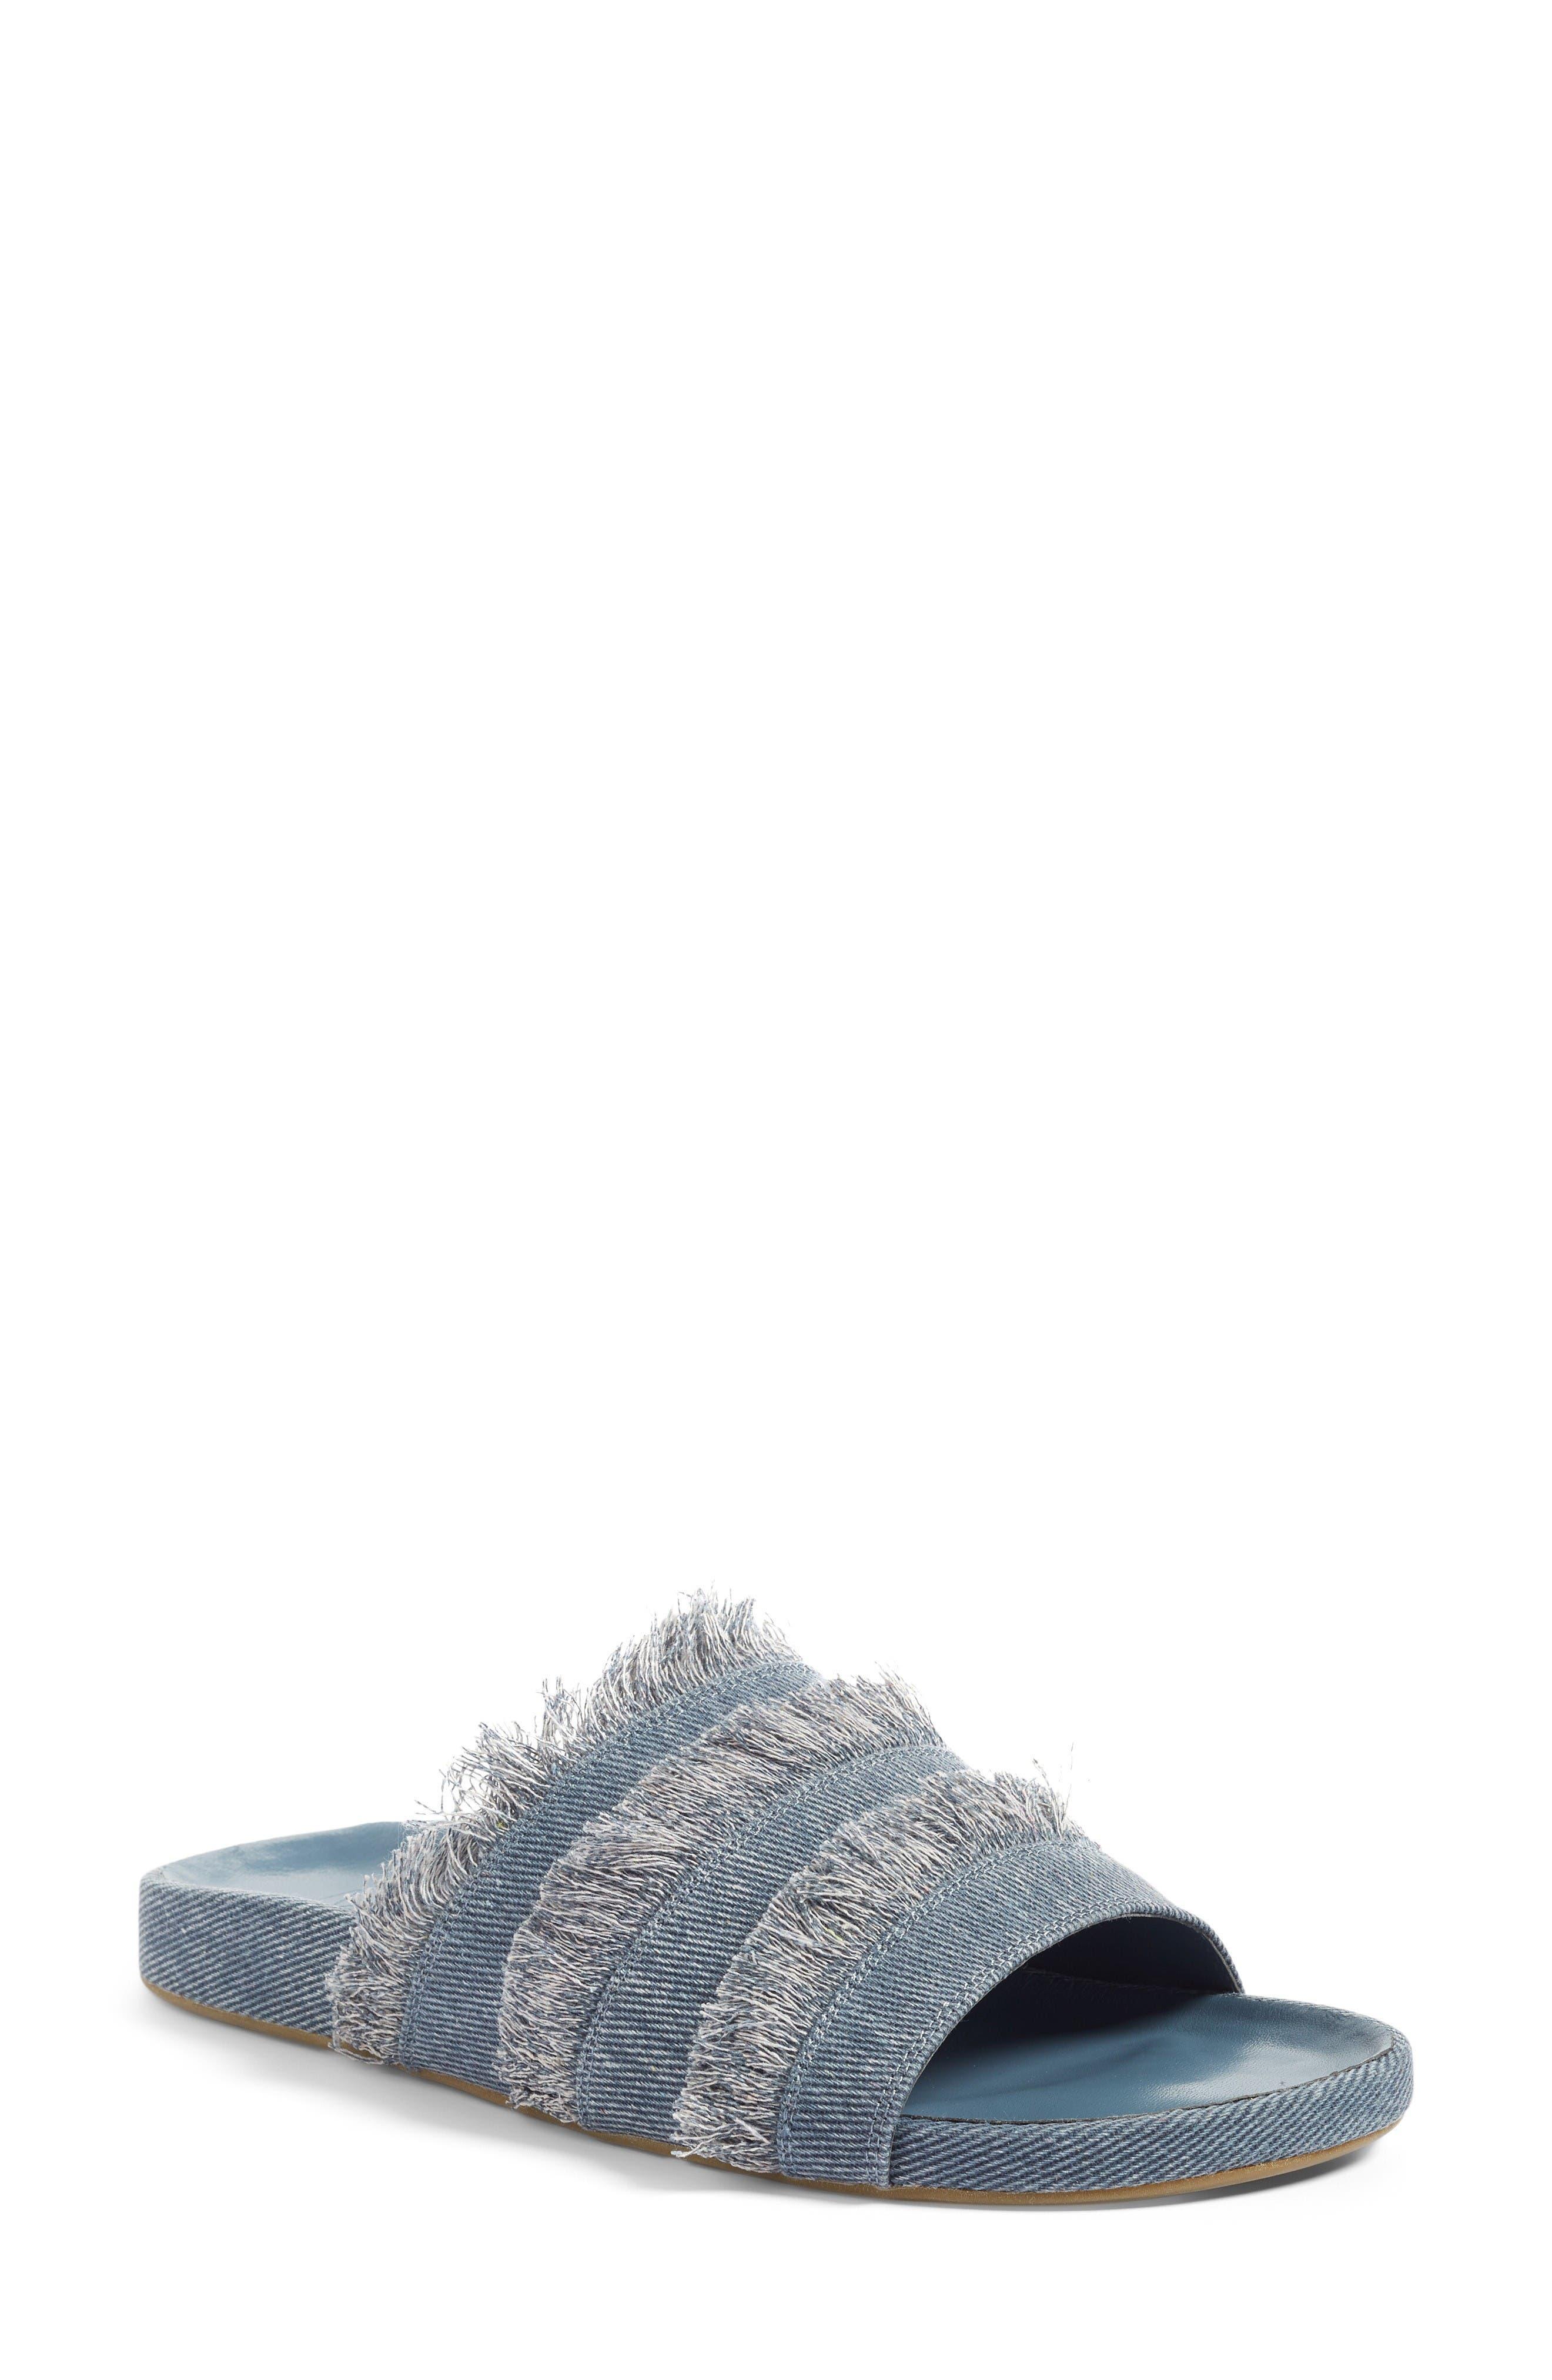 Jaden Slide Sandal,                         Main,                         color, Dark Denim